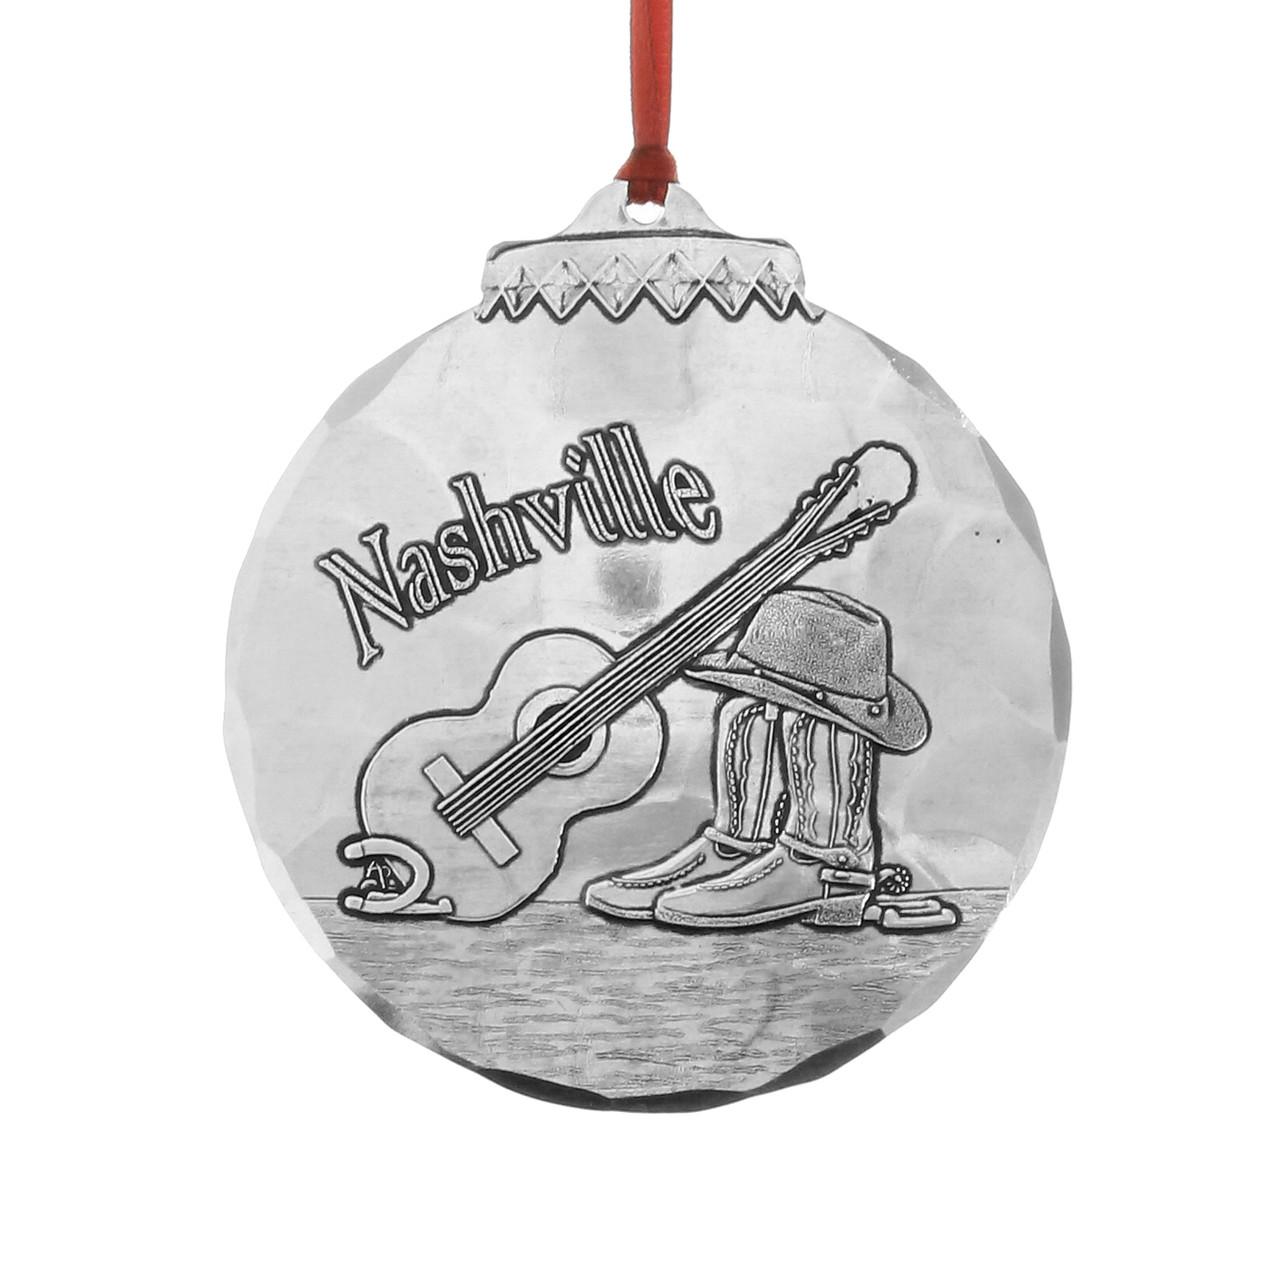 Christmas Music In August.Nashville Music City Ornament